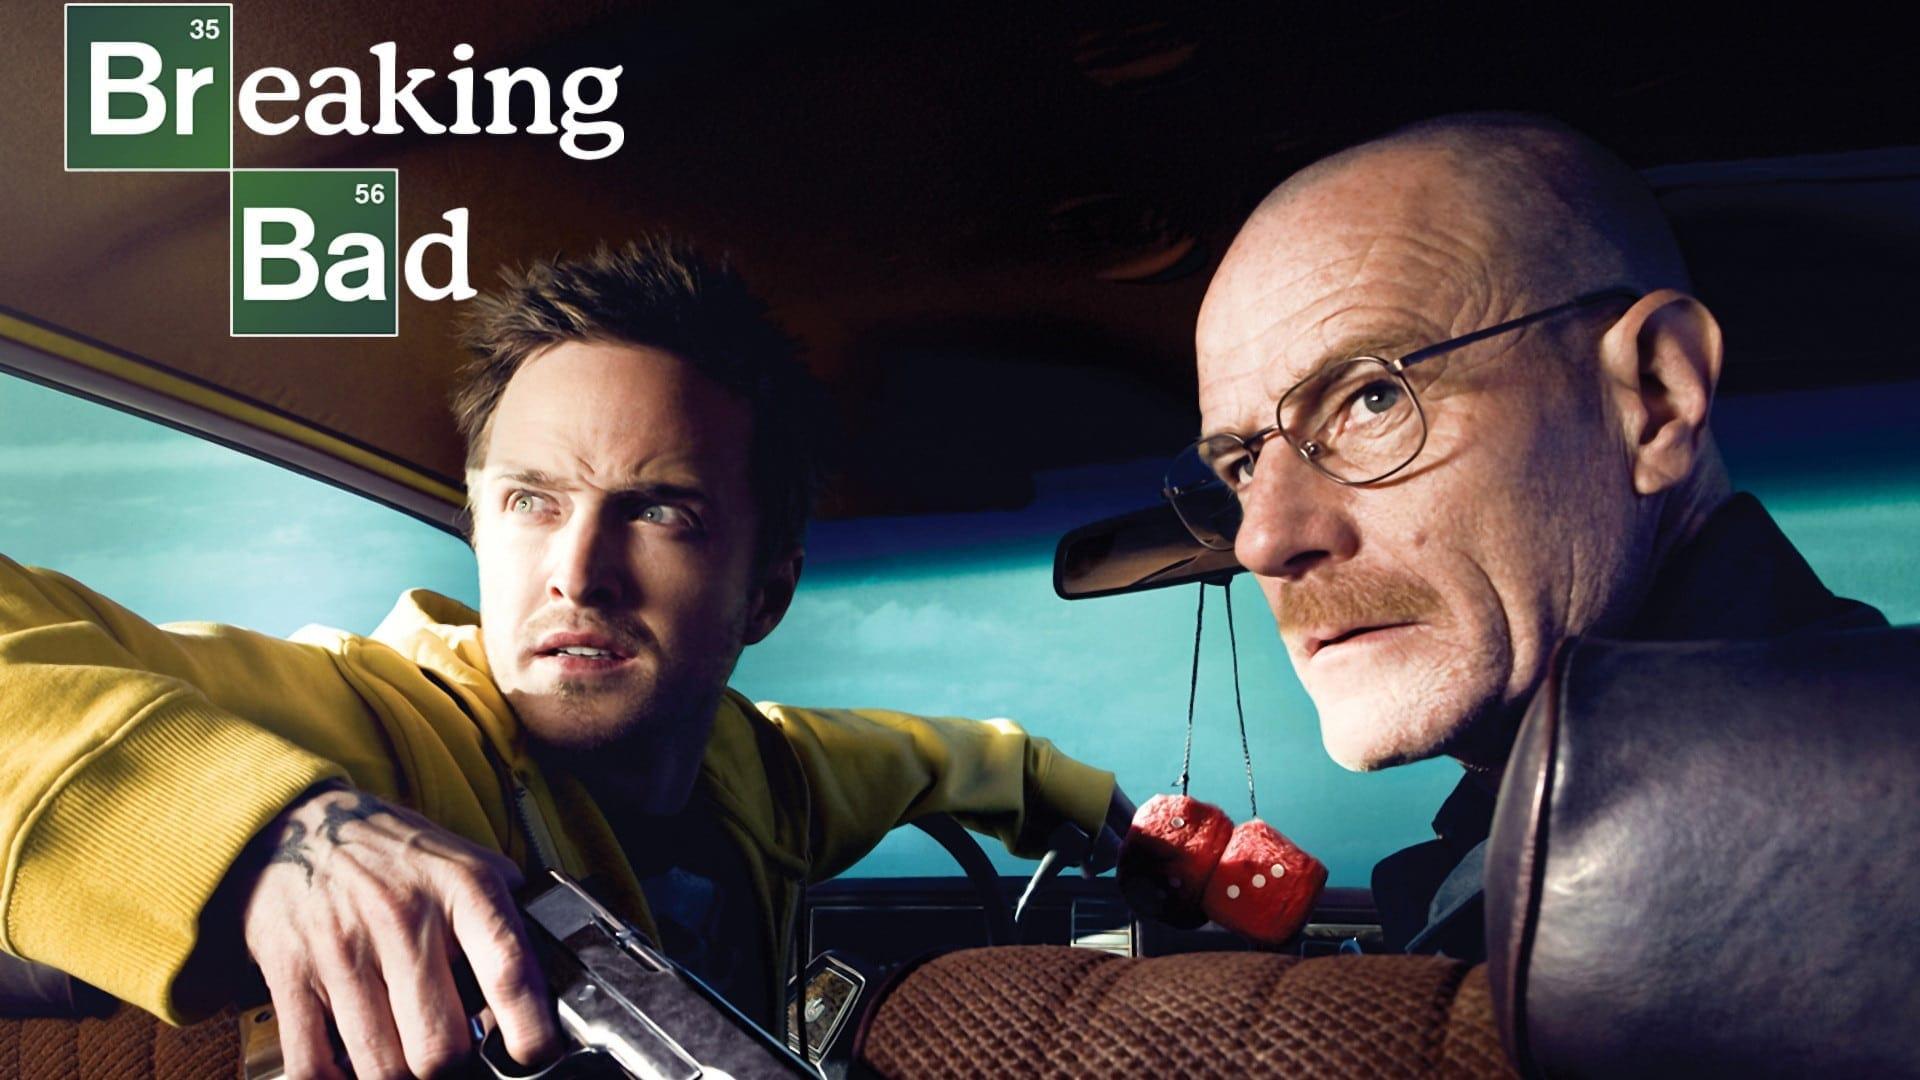 Breaking Bad - Season breaking Episode bad